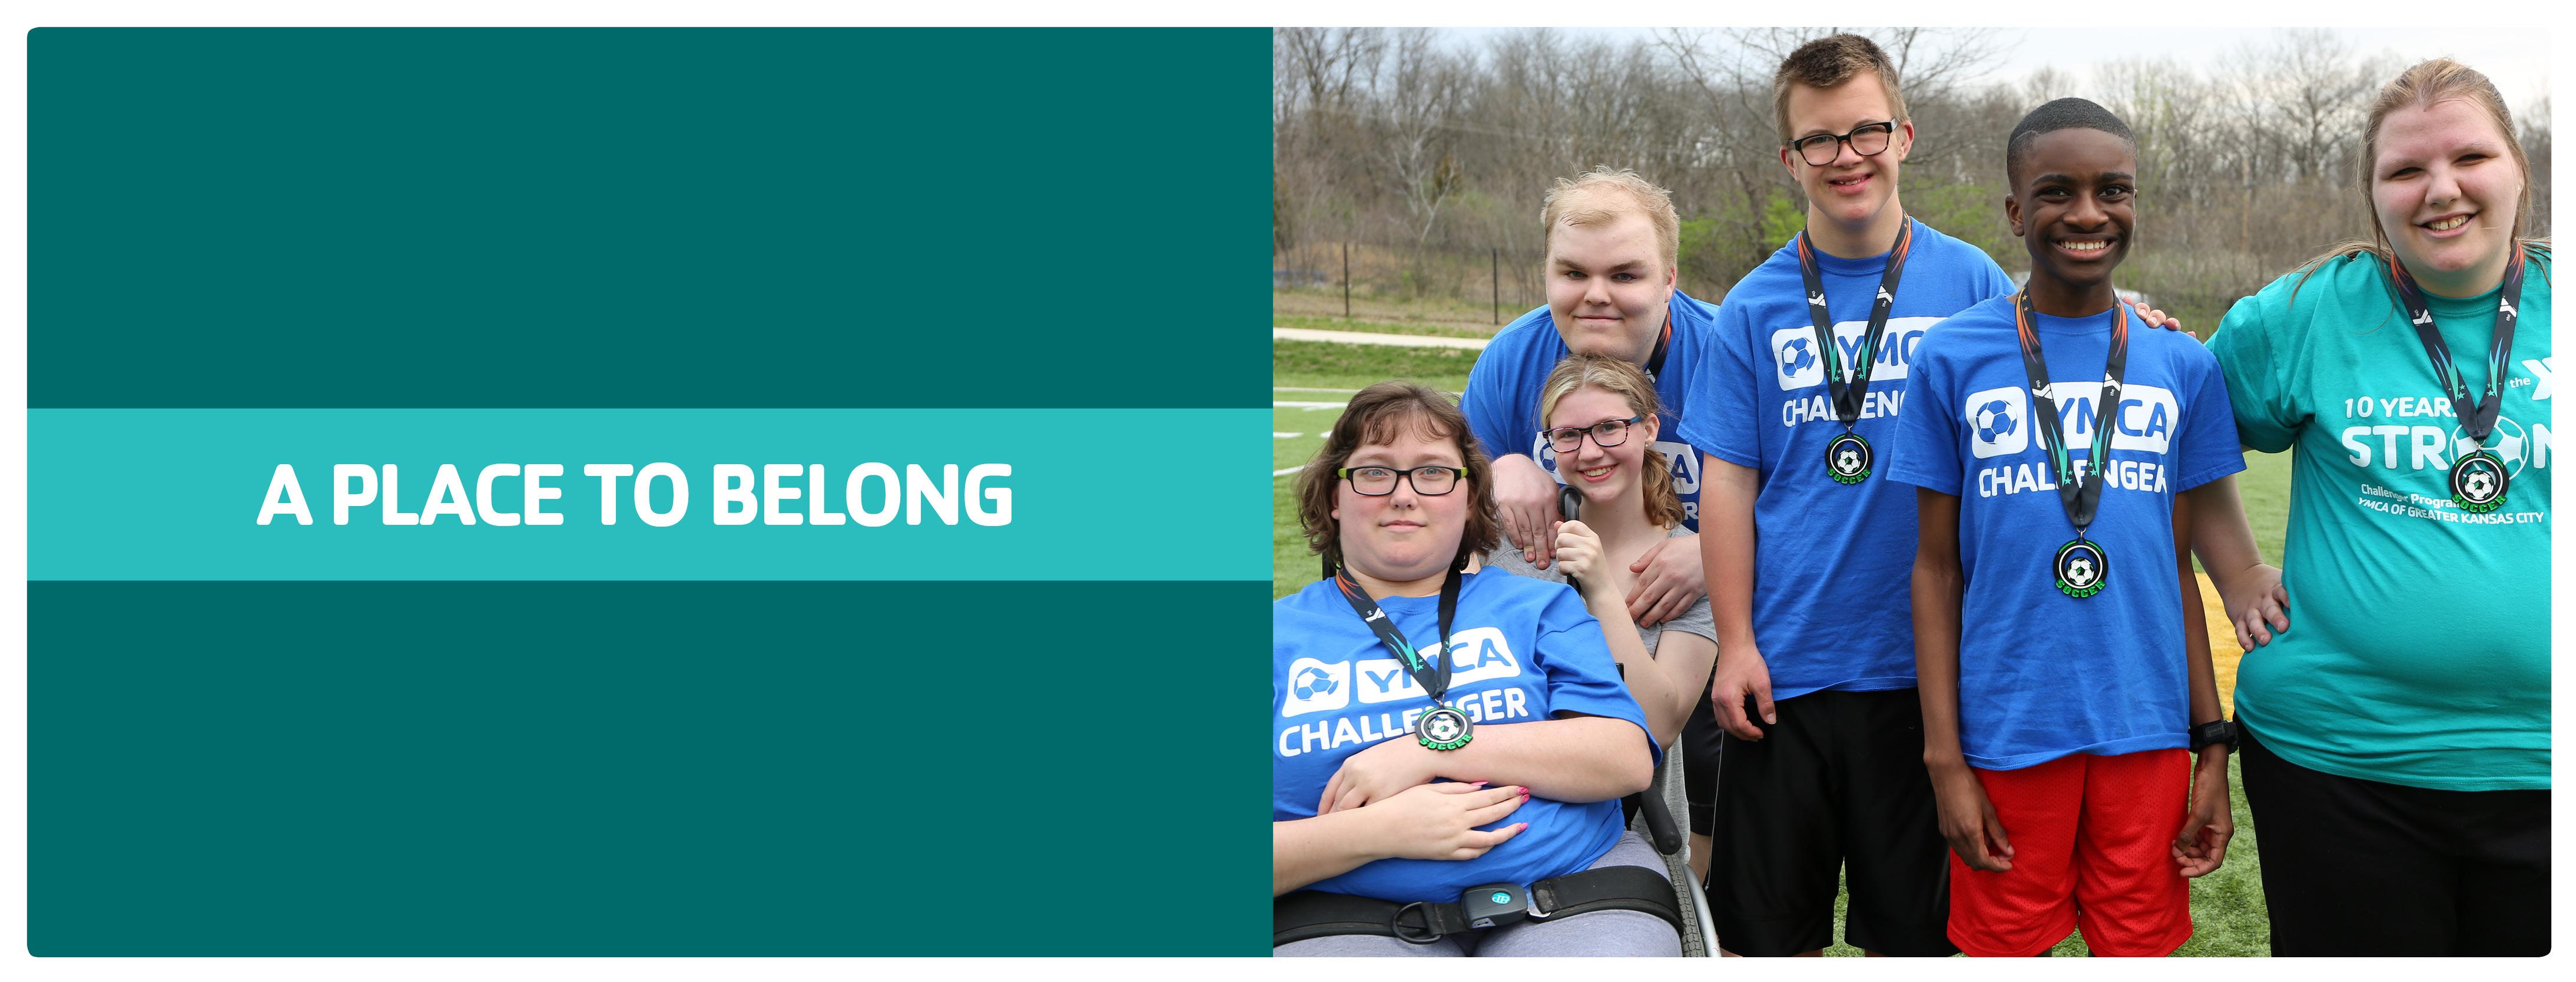 YMCA of Greater Kansas City - Challenger Program 2